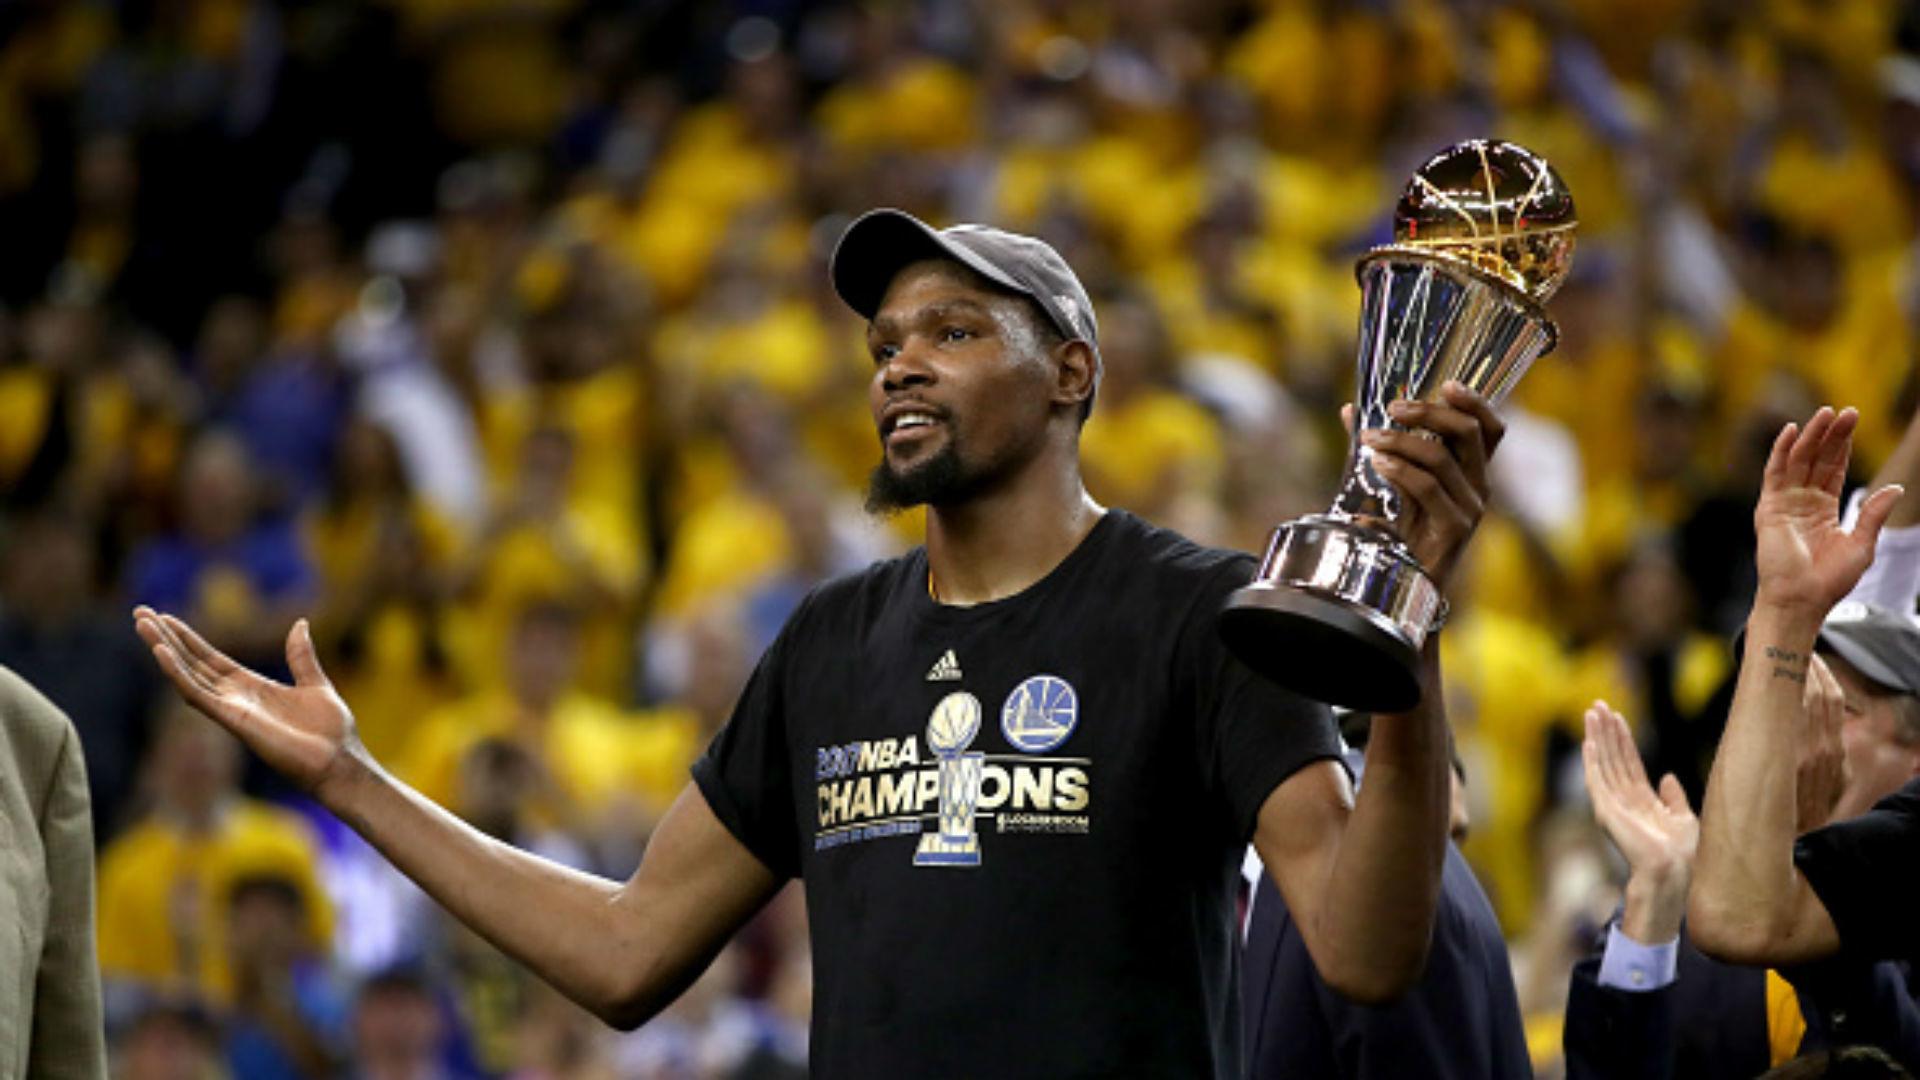 Nike airs 'Debate This' ad after Kevin Durant becomes NBA champion   NBA    Sporting News